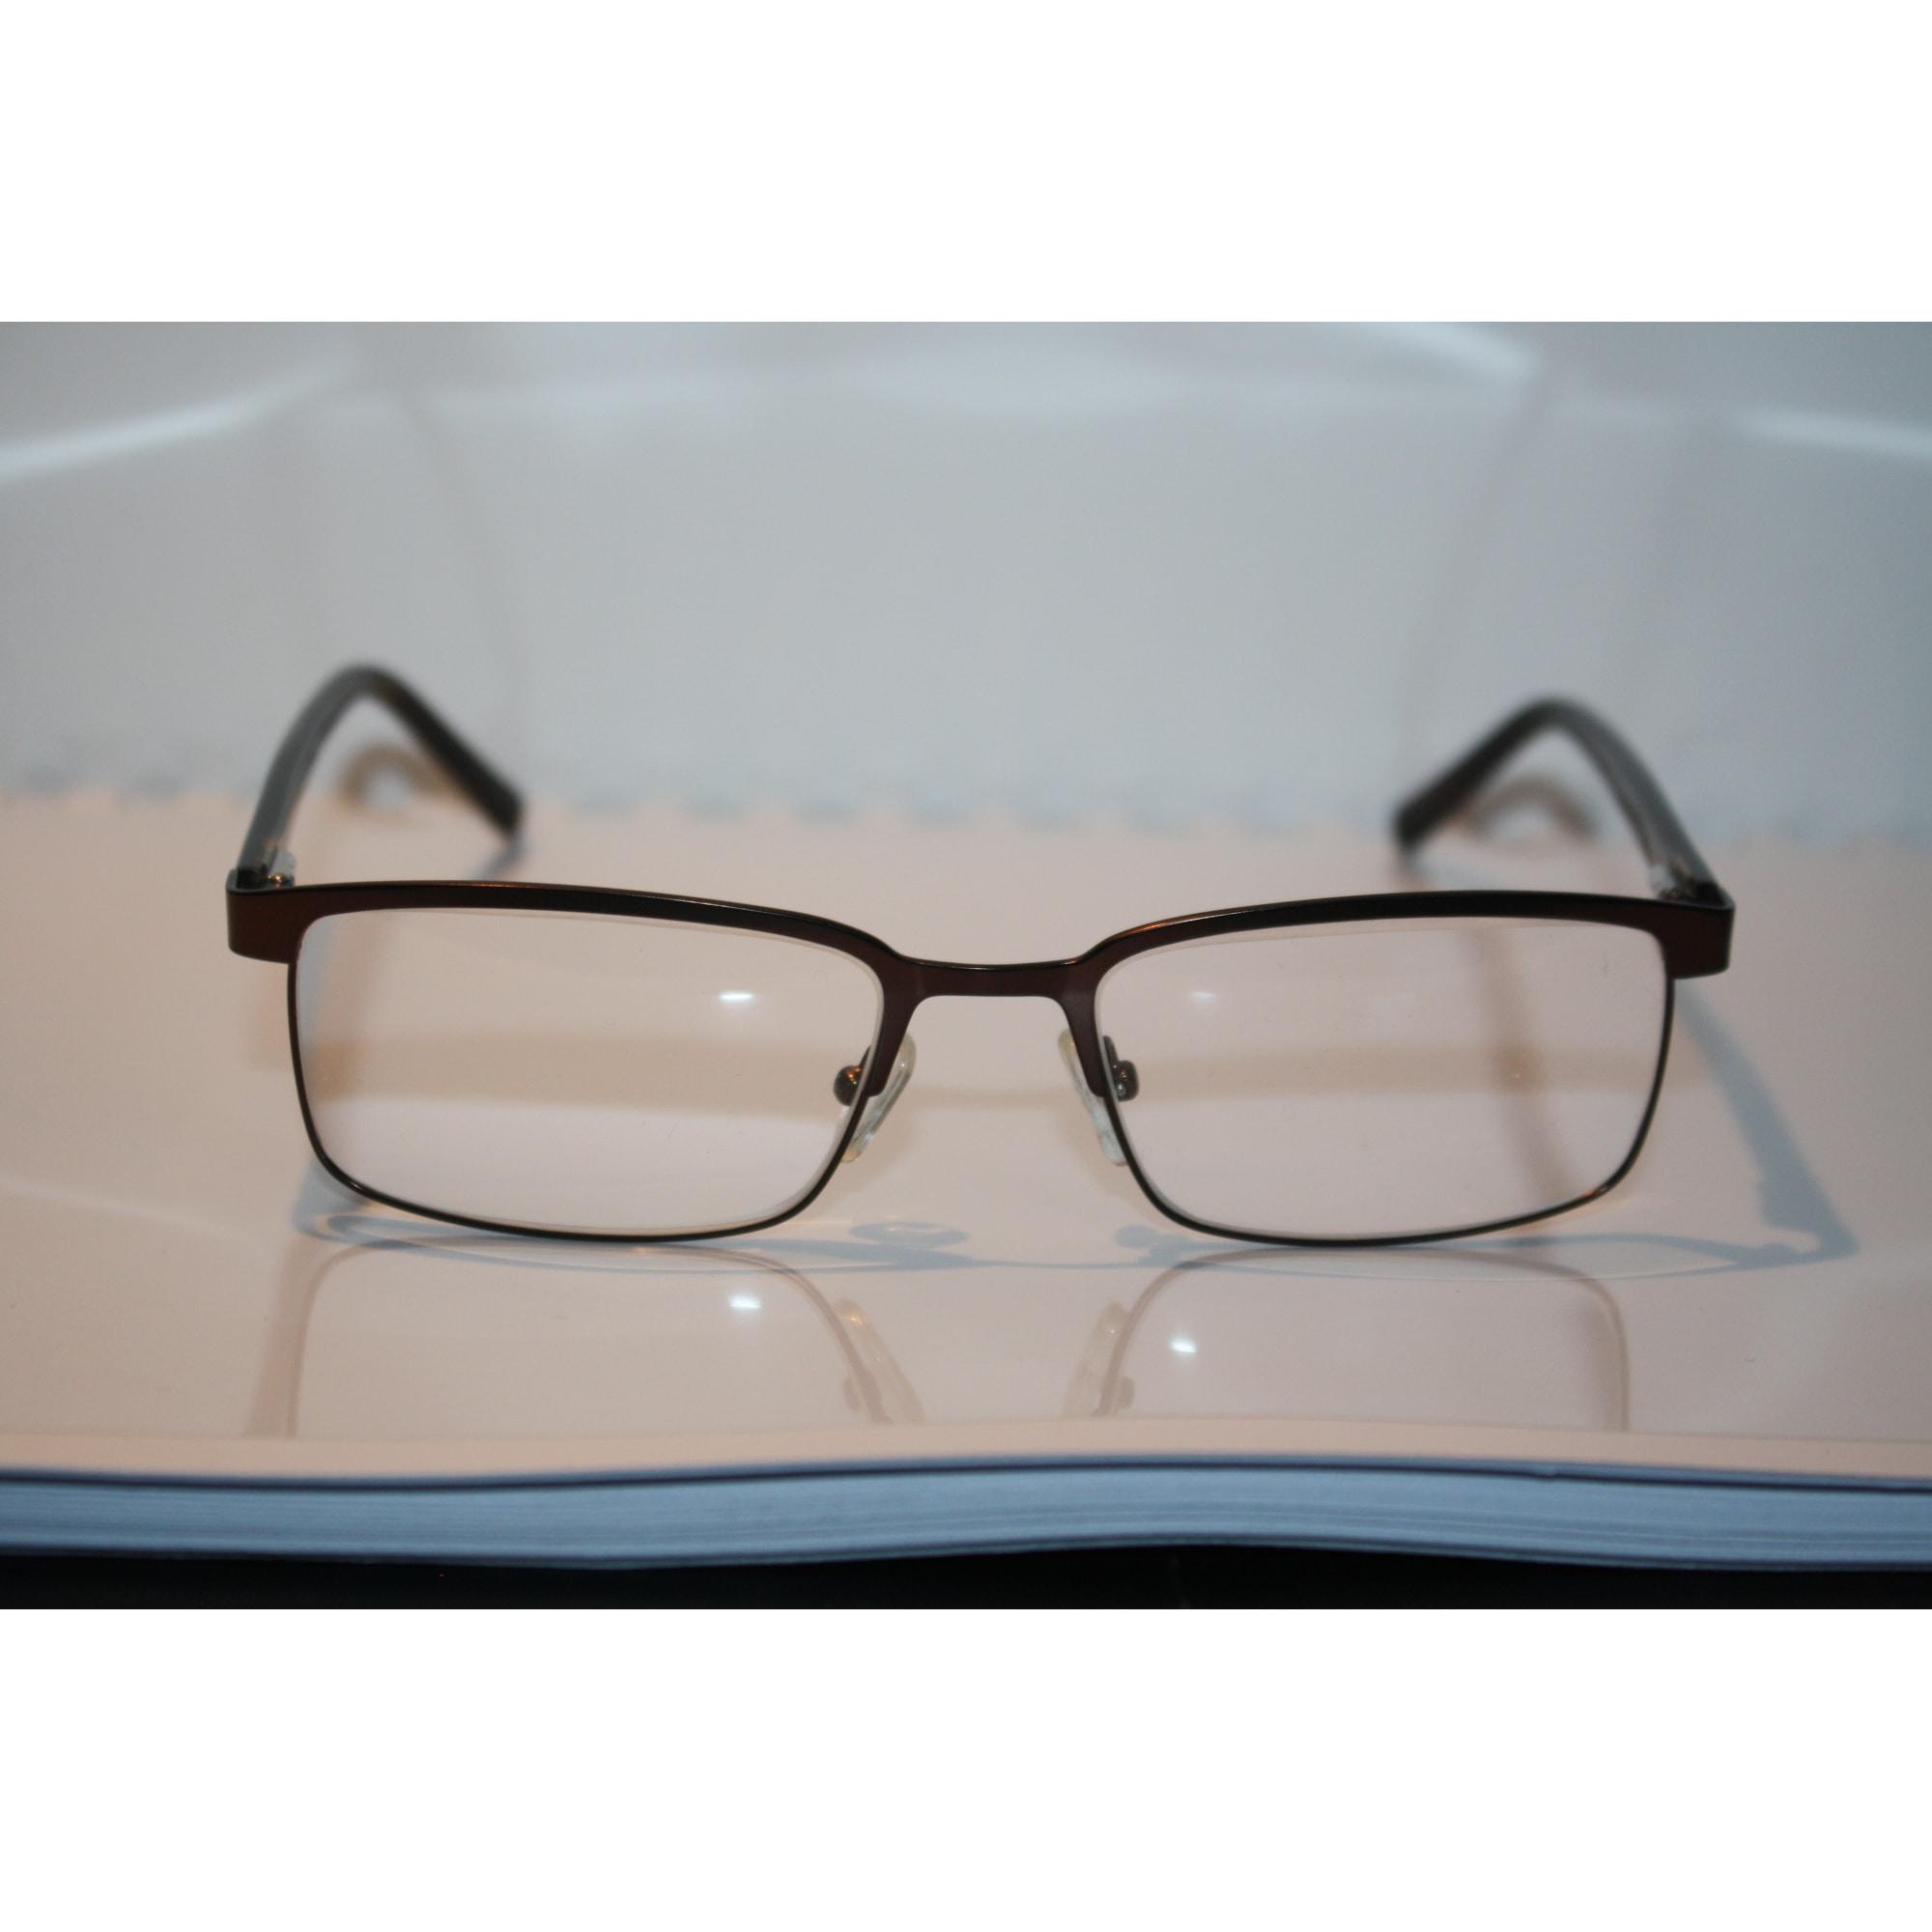 Eyeglass Frames MARQUE INCONNUE Golden, bronze, copper